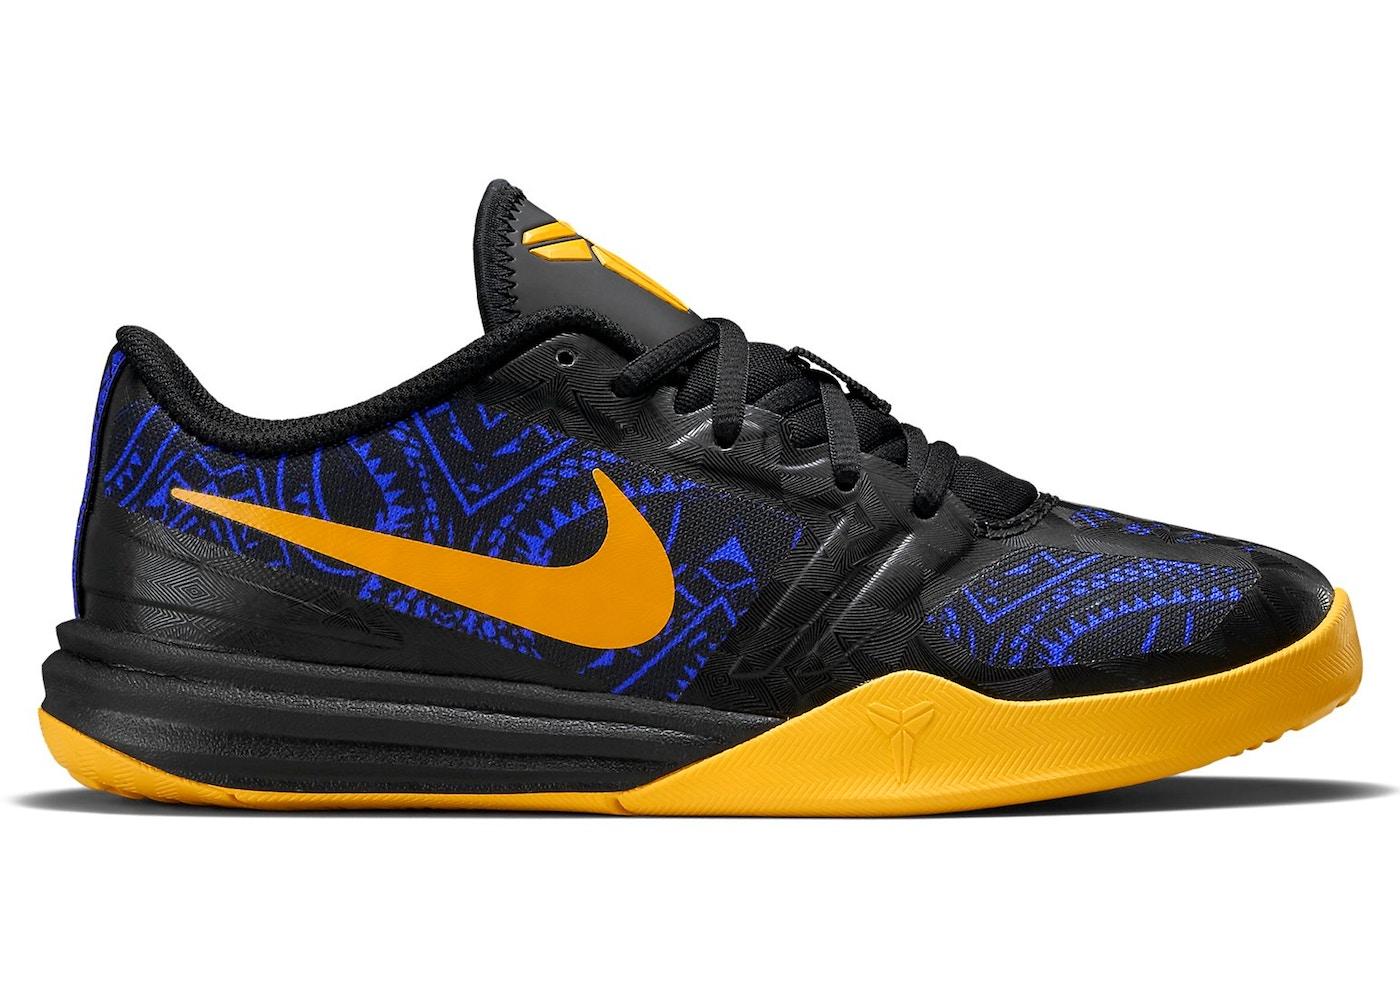 79cd17885de4 Nike KB Mentality Lakers (GS) - 705387-501